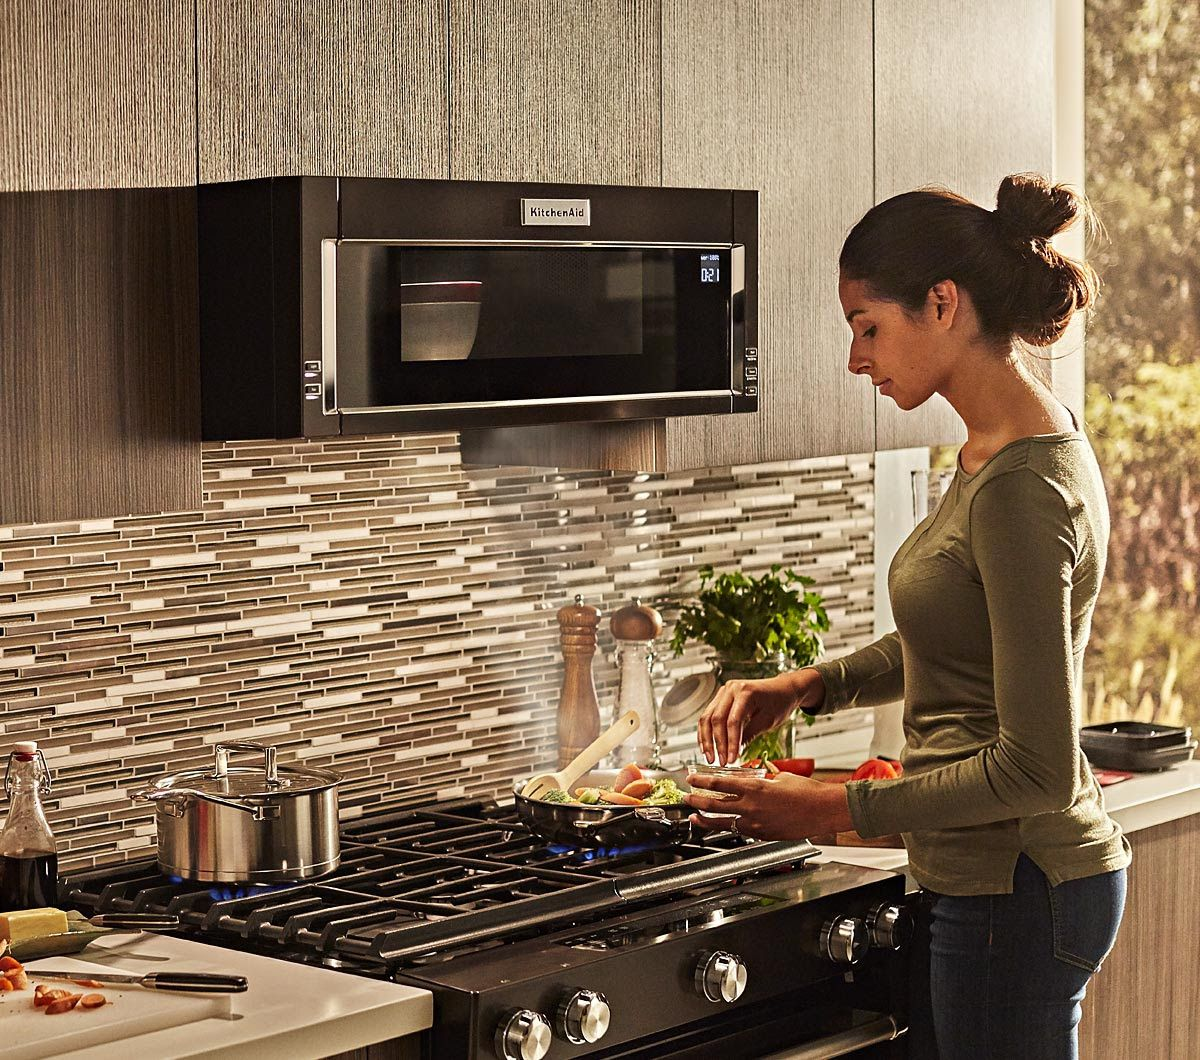 kitchenaid low profile microwave and